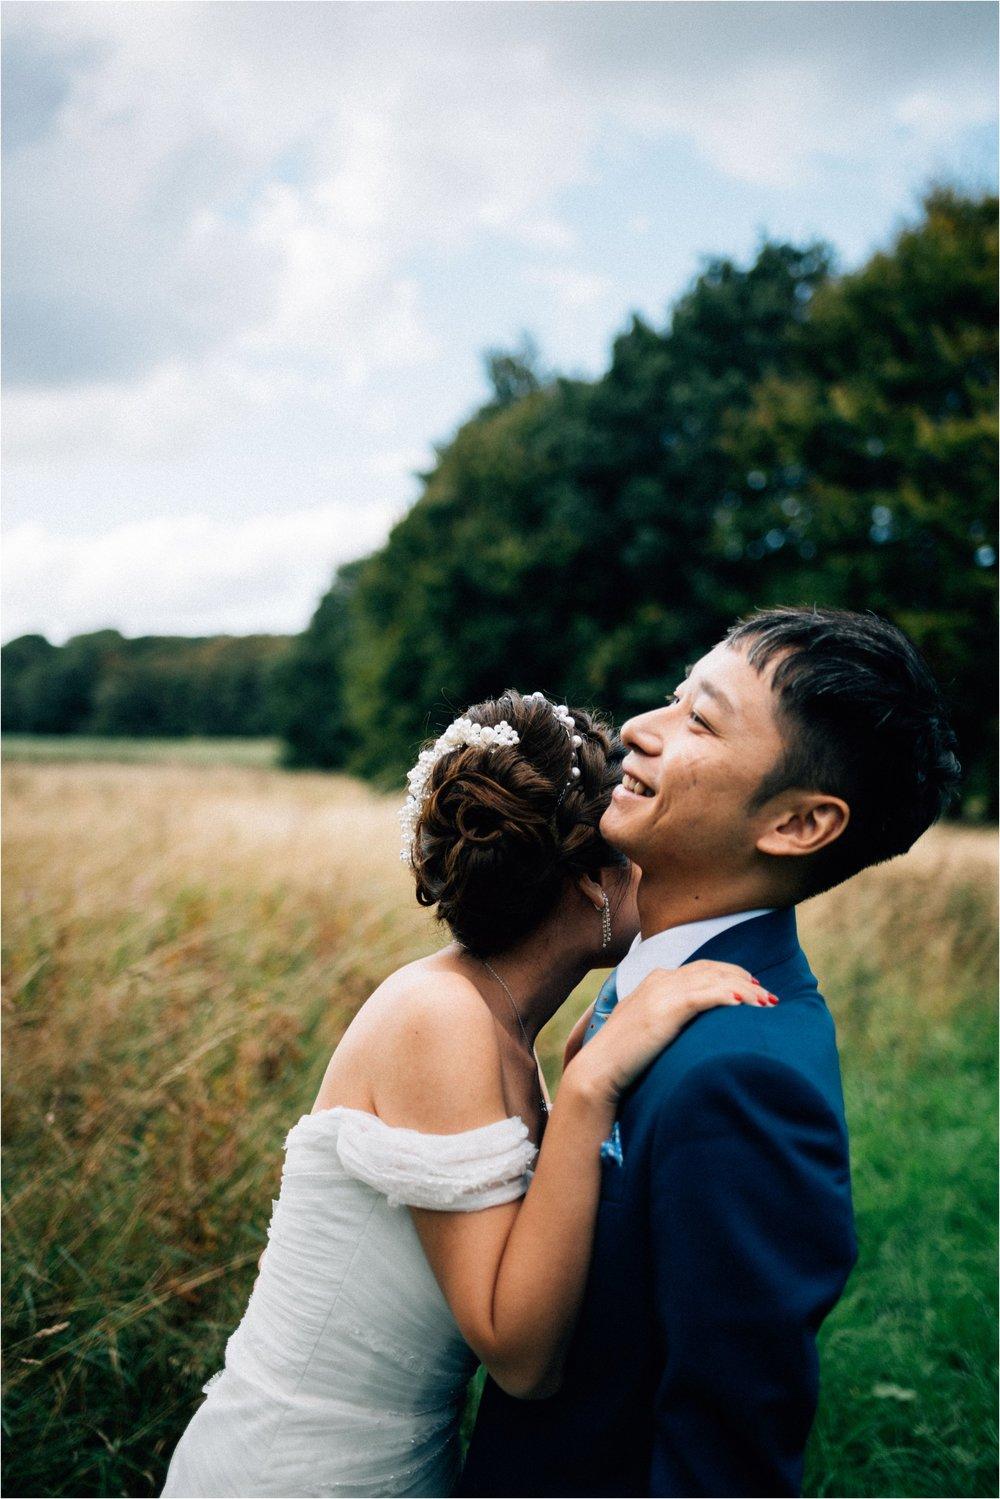 York city elopement wedding photographer_0207.jpg